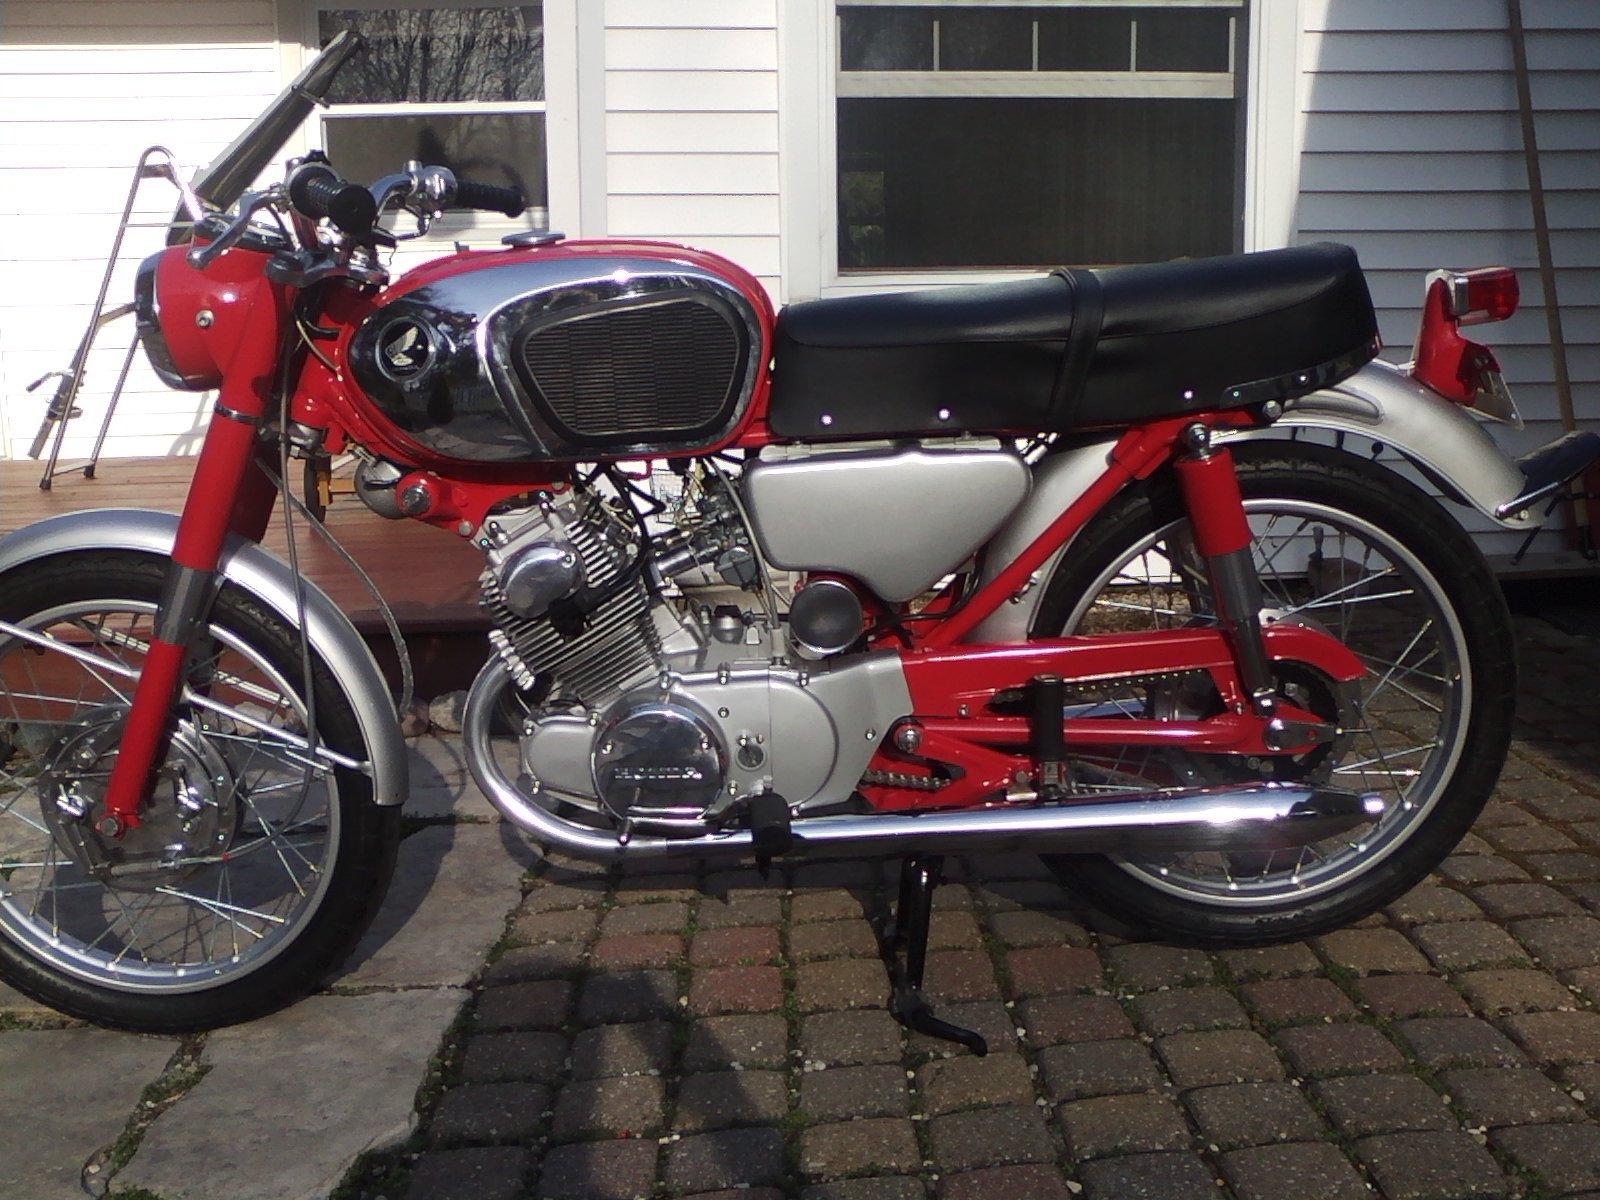 Restored Honda CB160 - 1968 Photographs at Classic Bikes ...